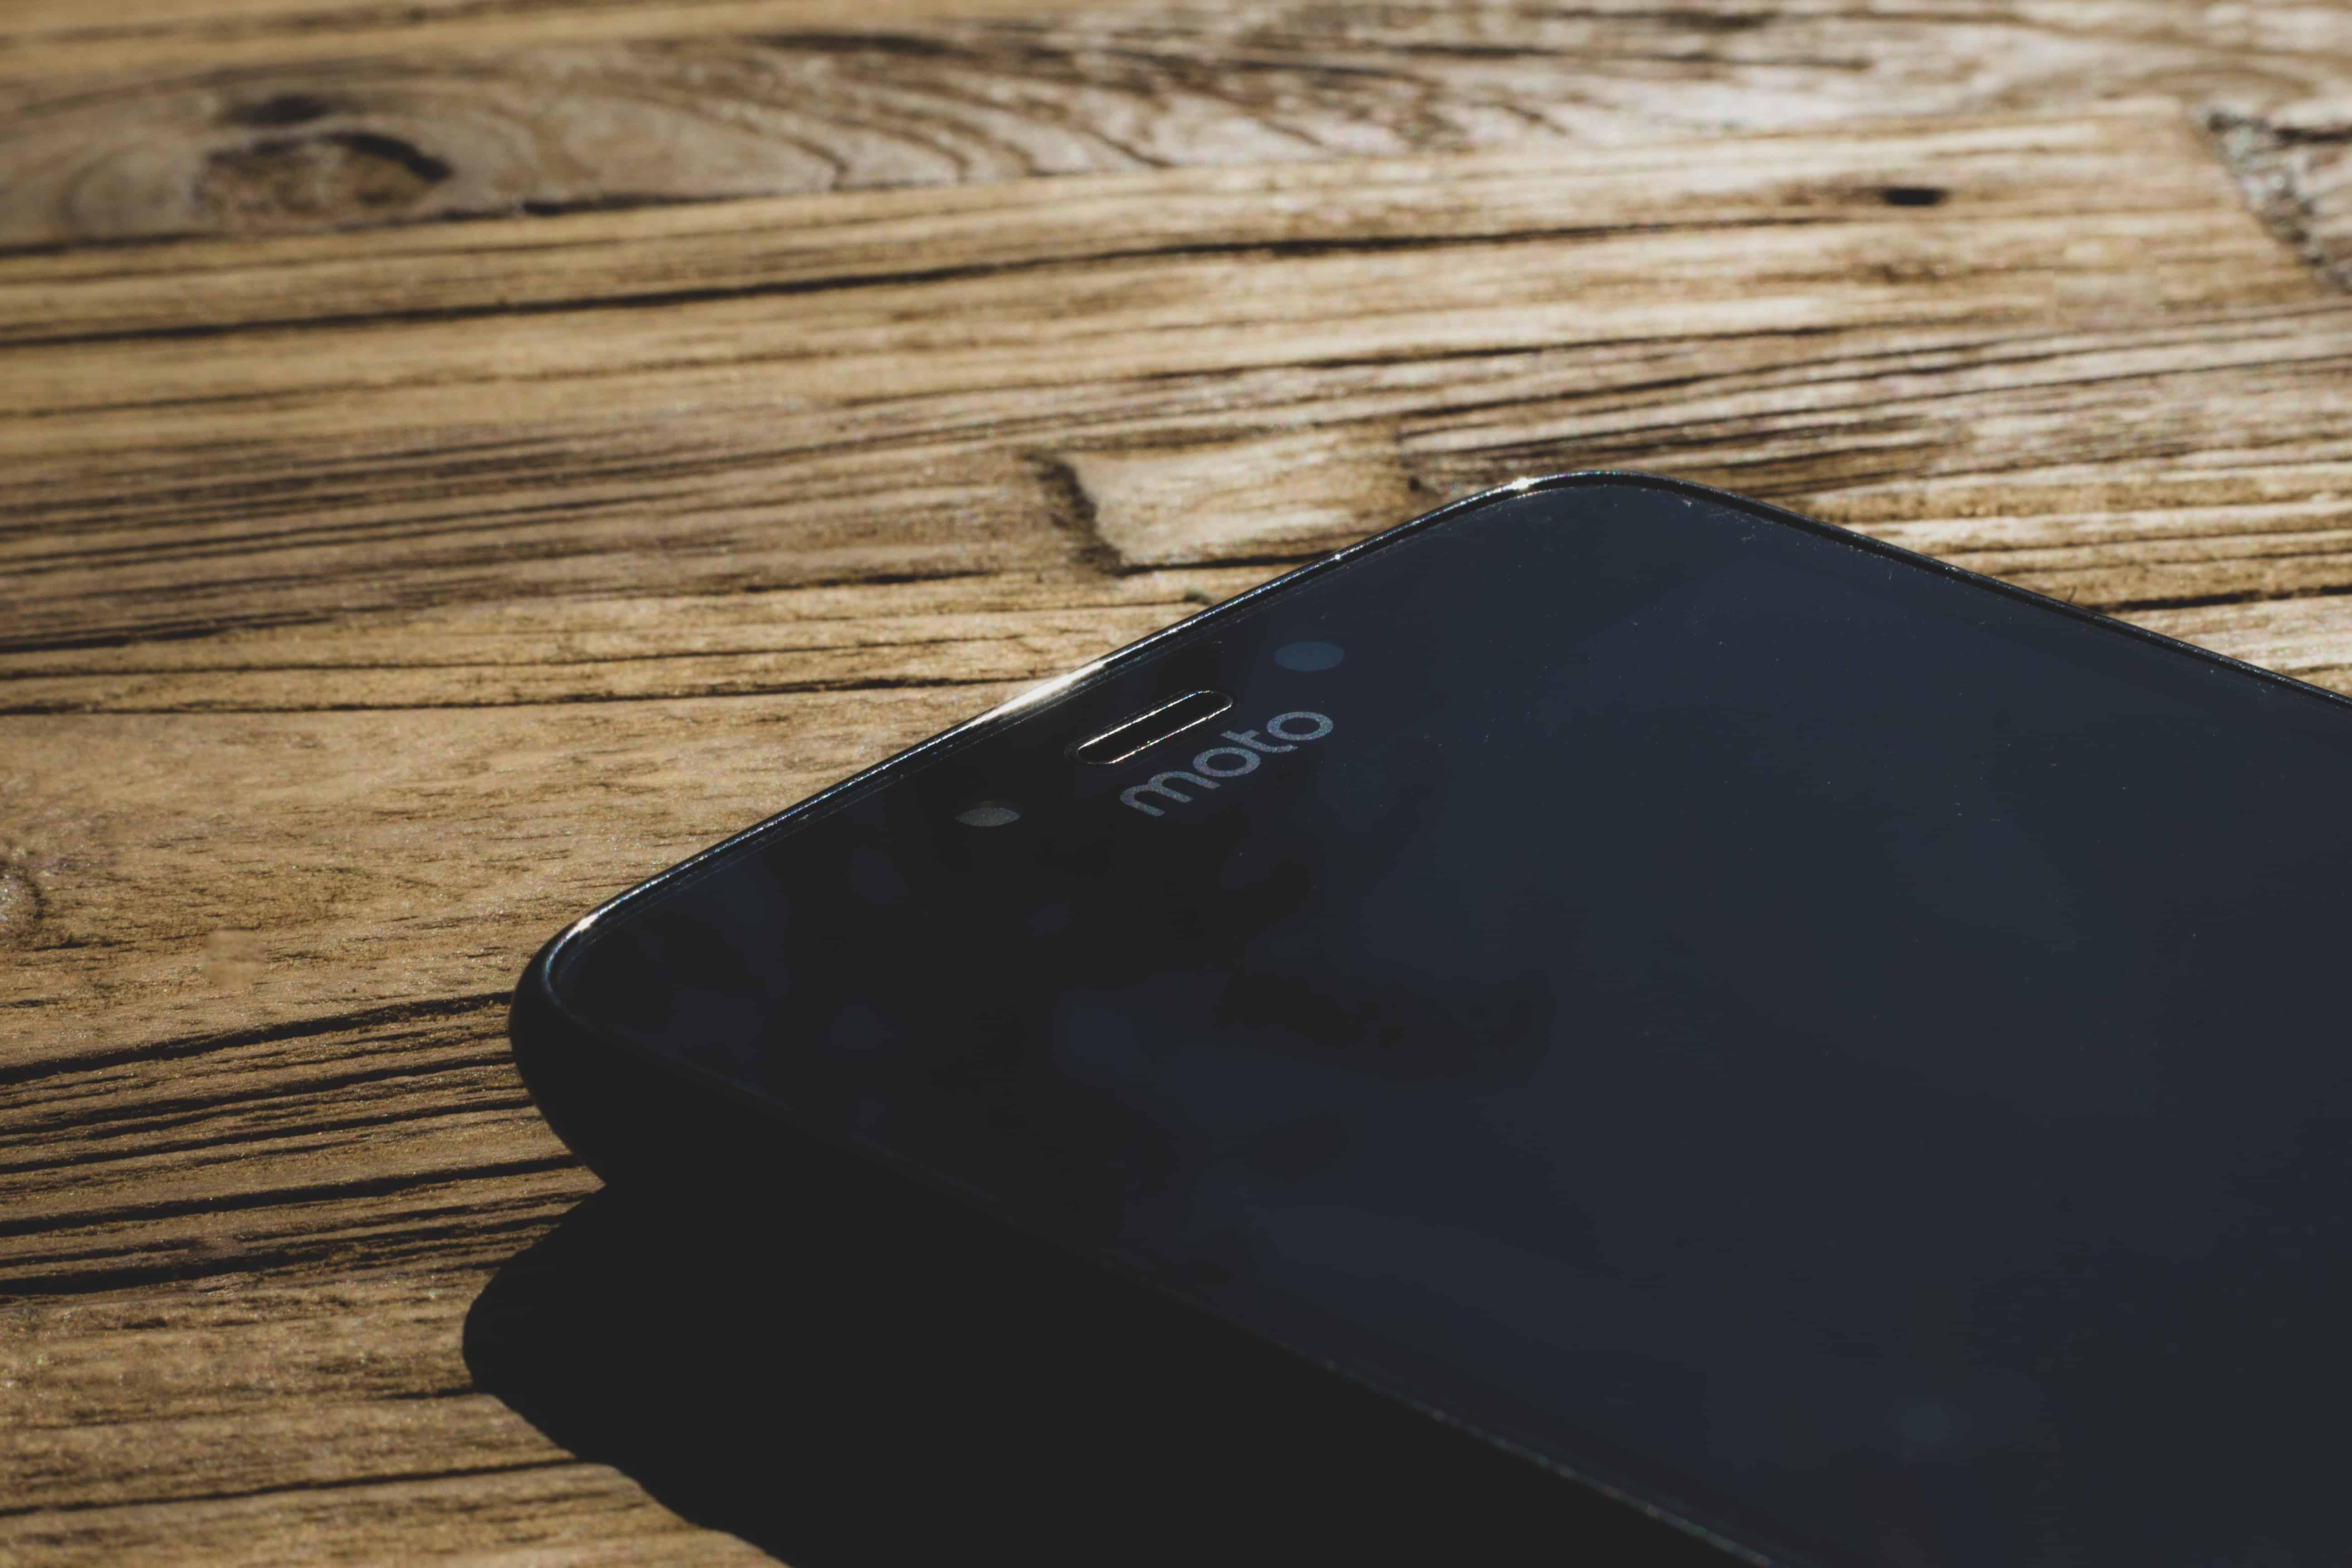 a Motorola Moto phone